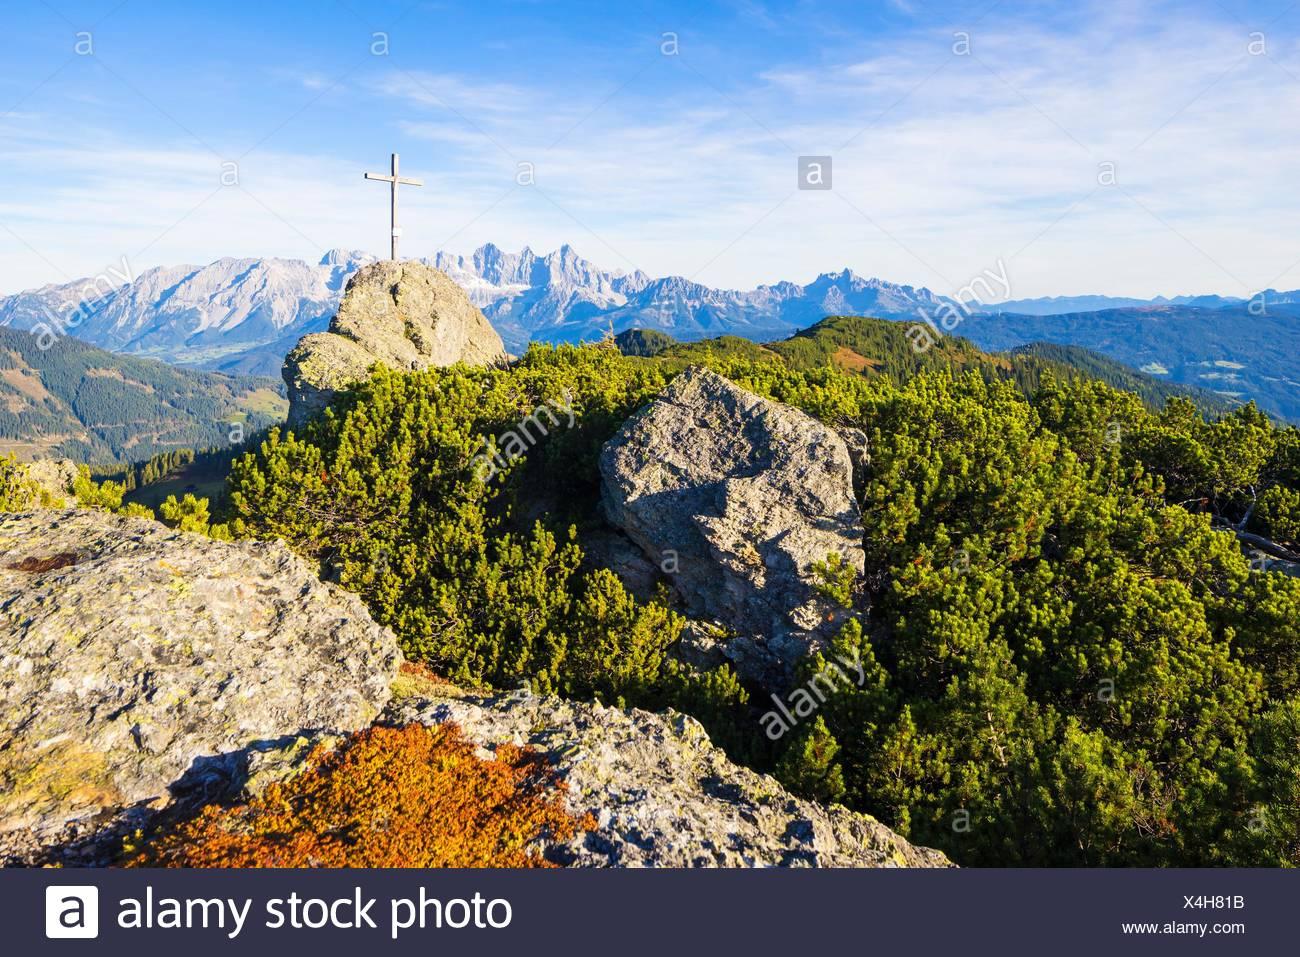 Landschaft, Berg, Gebirge, Alpen, Europa, Westeuropa, Mitteleuropa, Österreich, Salzburger Land, Himmel, Ruhe, Konzept, Idylle, Reise, Natur, n Stockbild